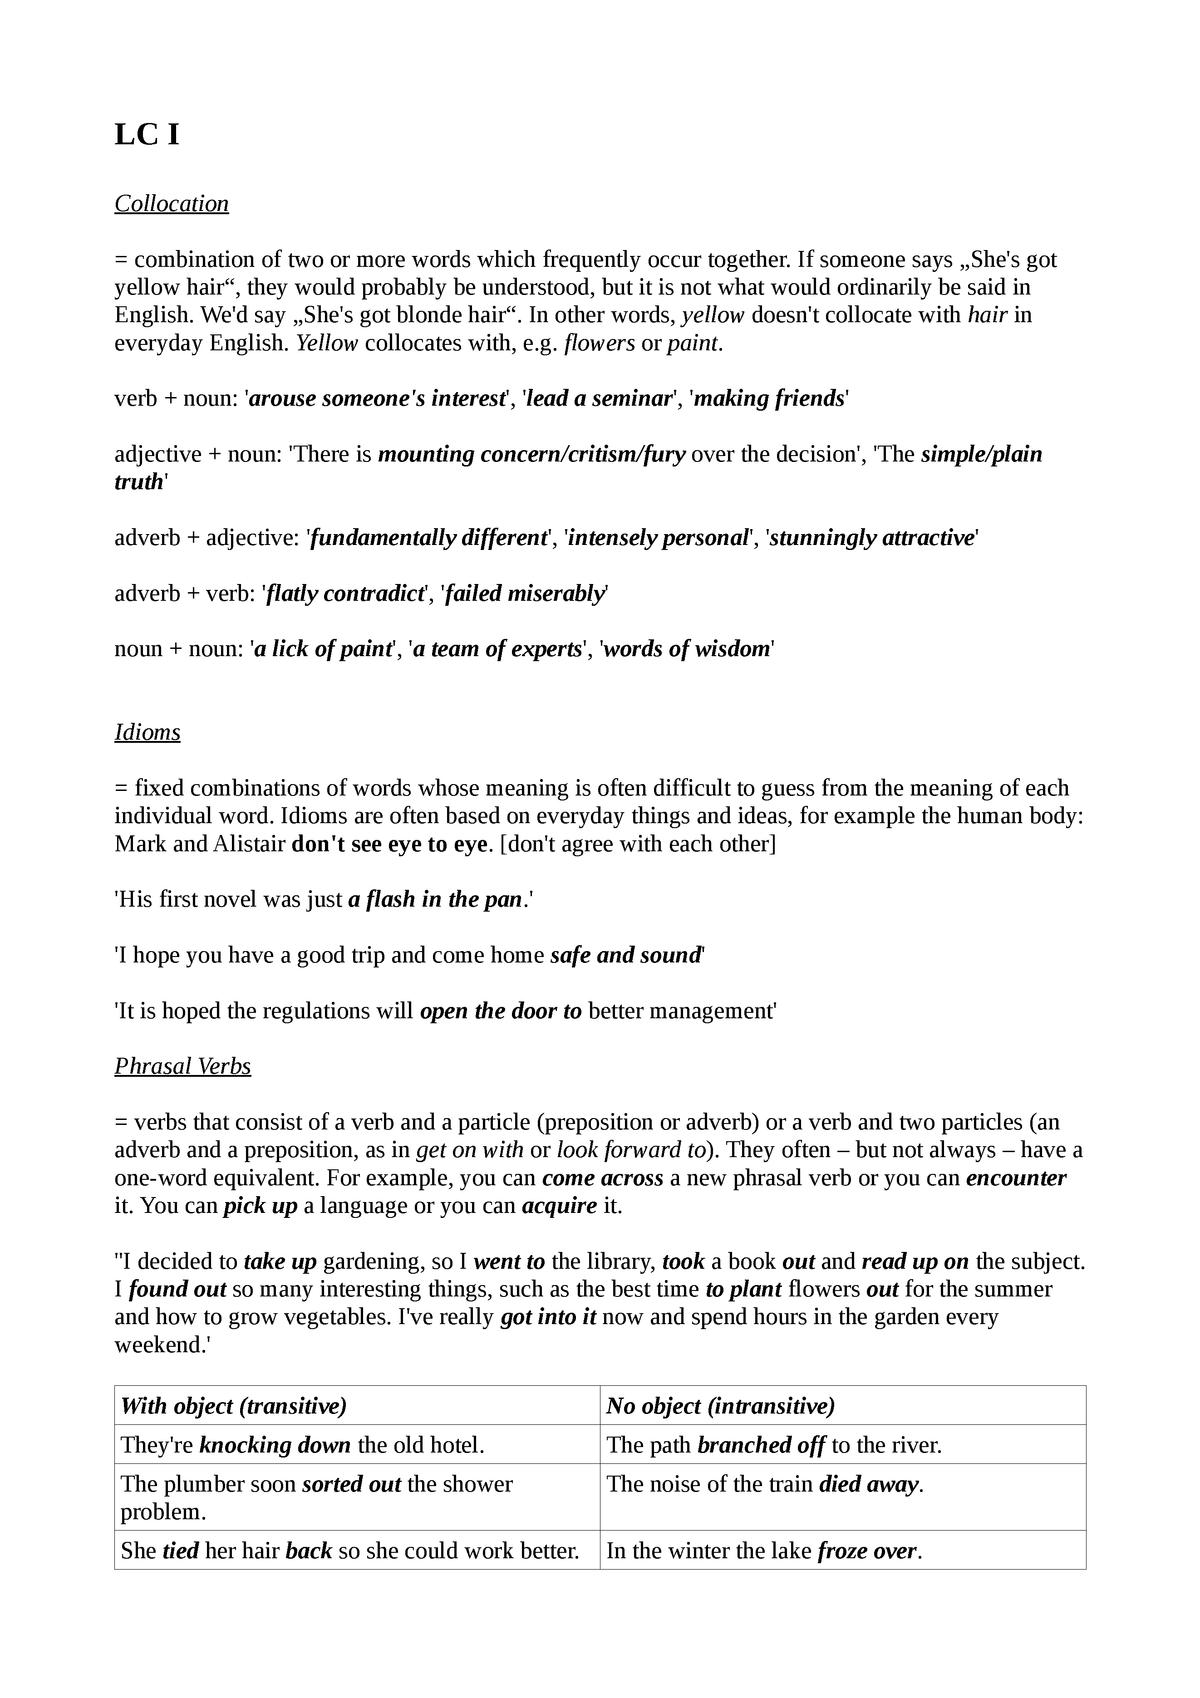 LC I - Summary Language Course I - 6204 - StuDocu